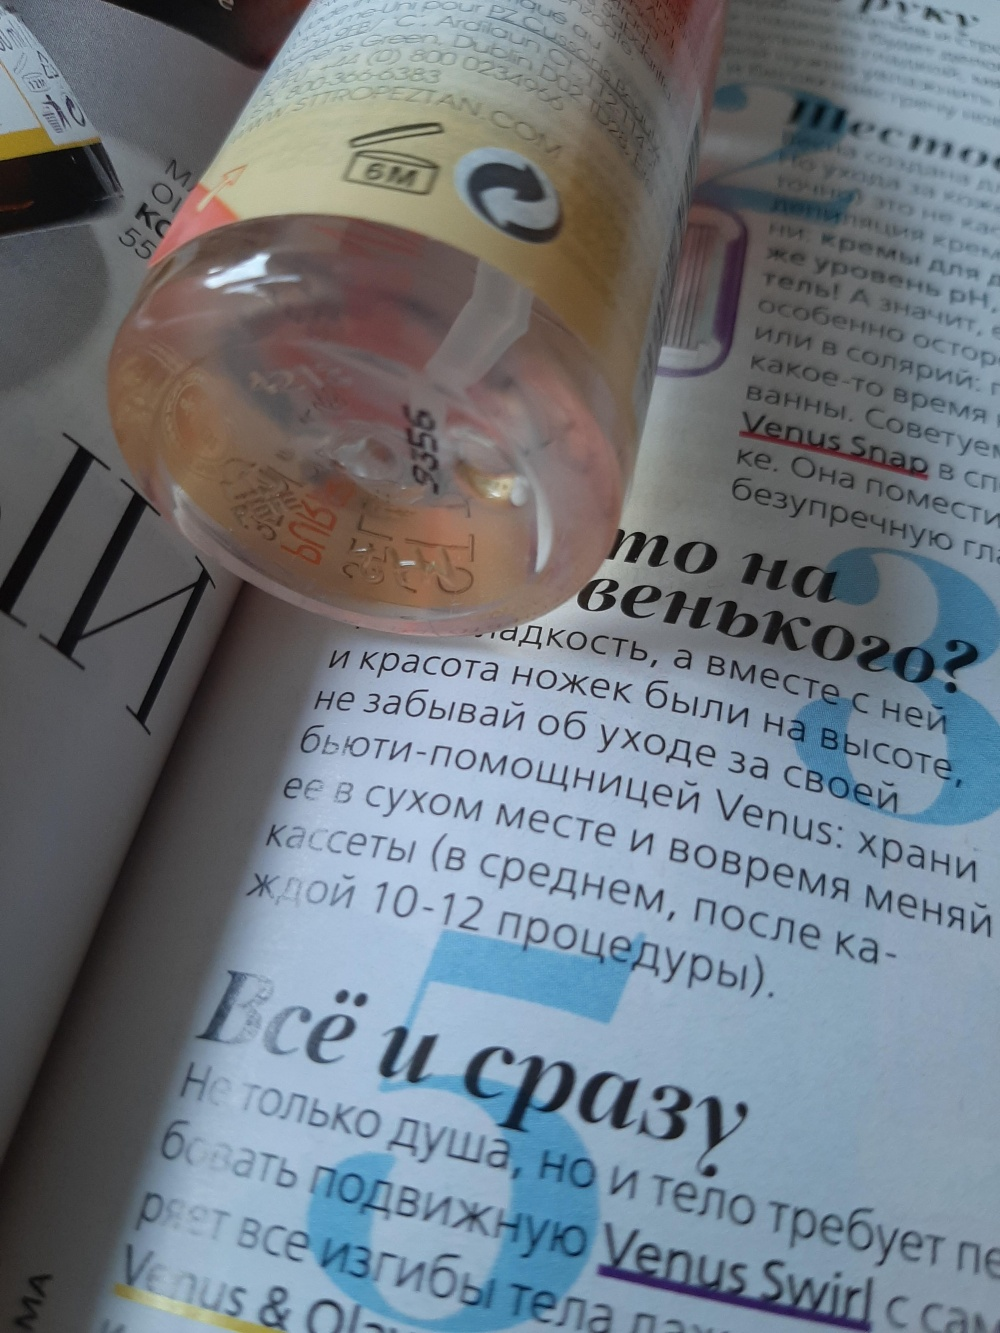 Спрей-автозагар с витамином С и D объемом 35 мл St. Tropez - Self Tan Purity Glow Boosting